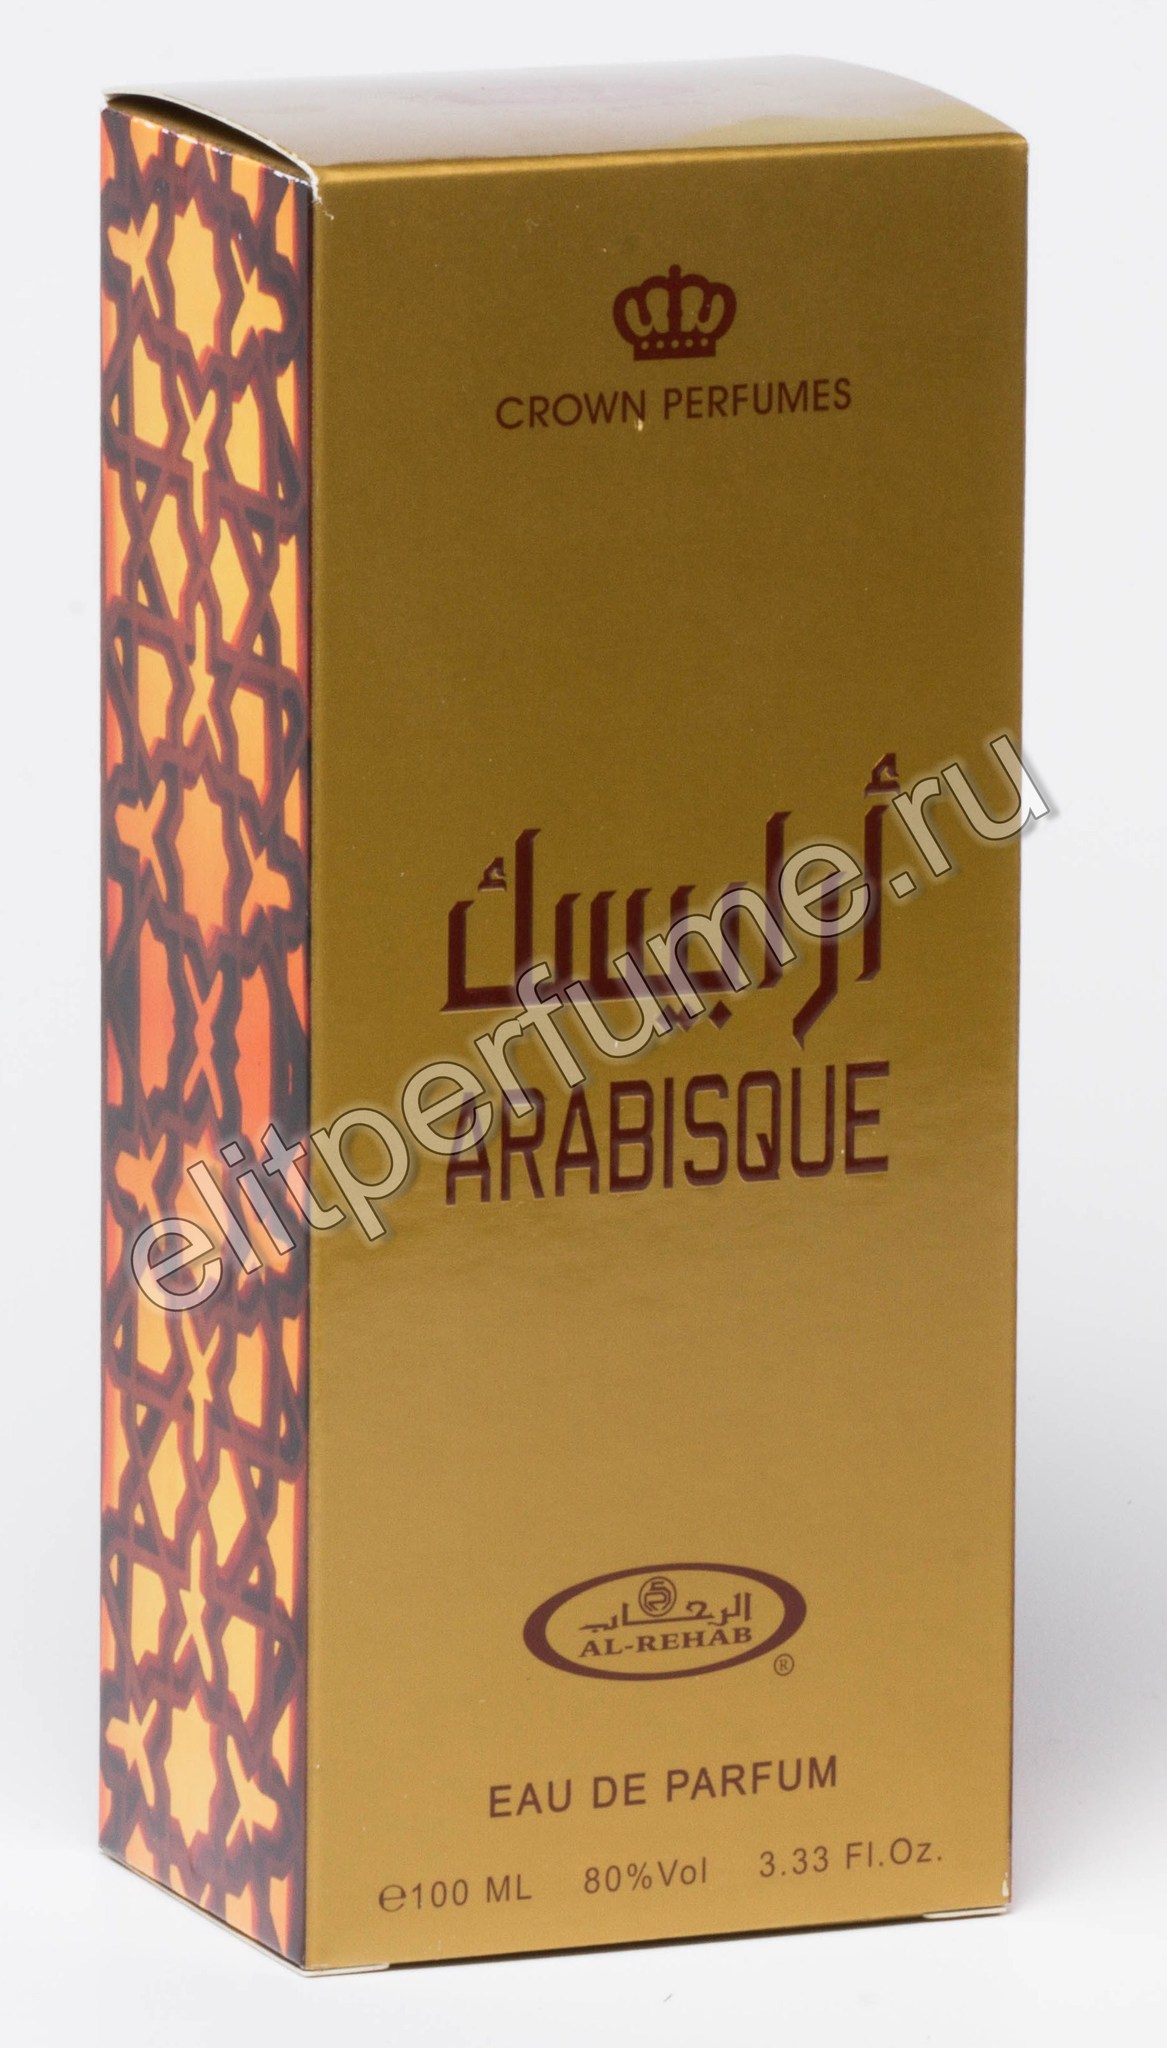 Arabesque Арабеске 100 мл спрей от Аль Рехаб Al Rehab